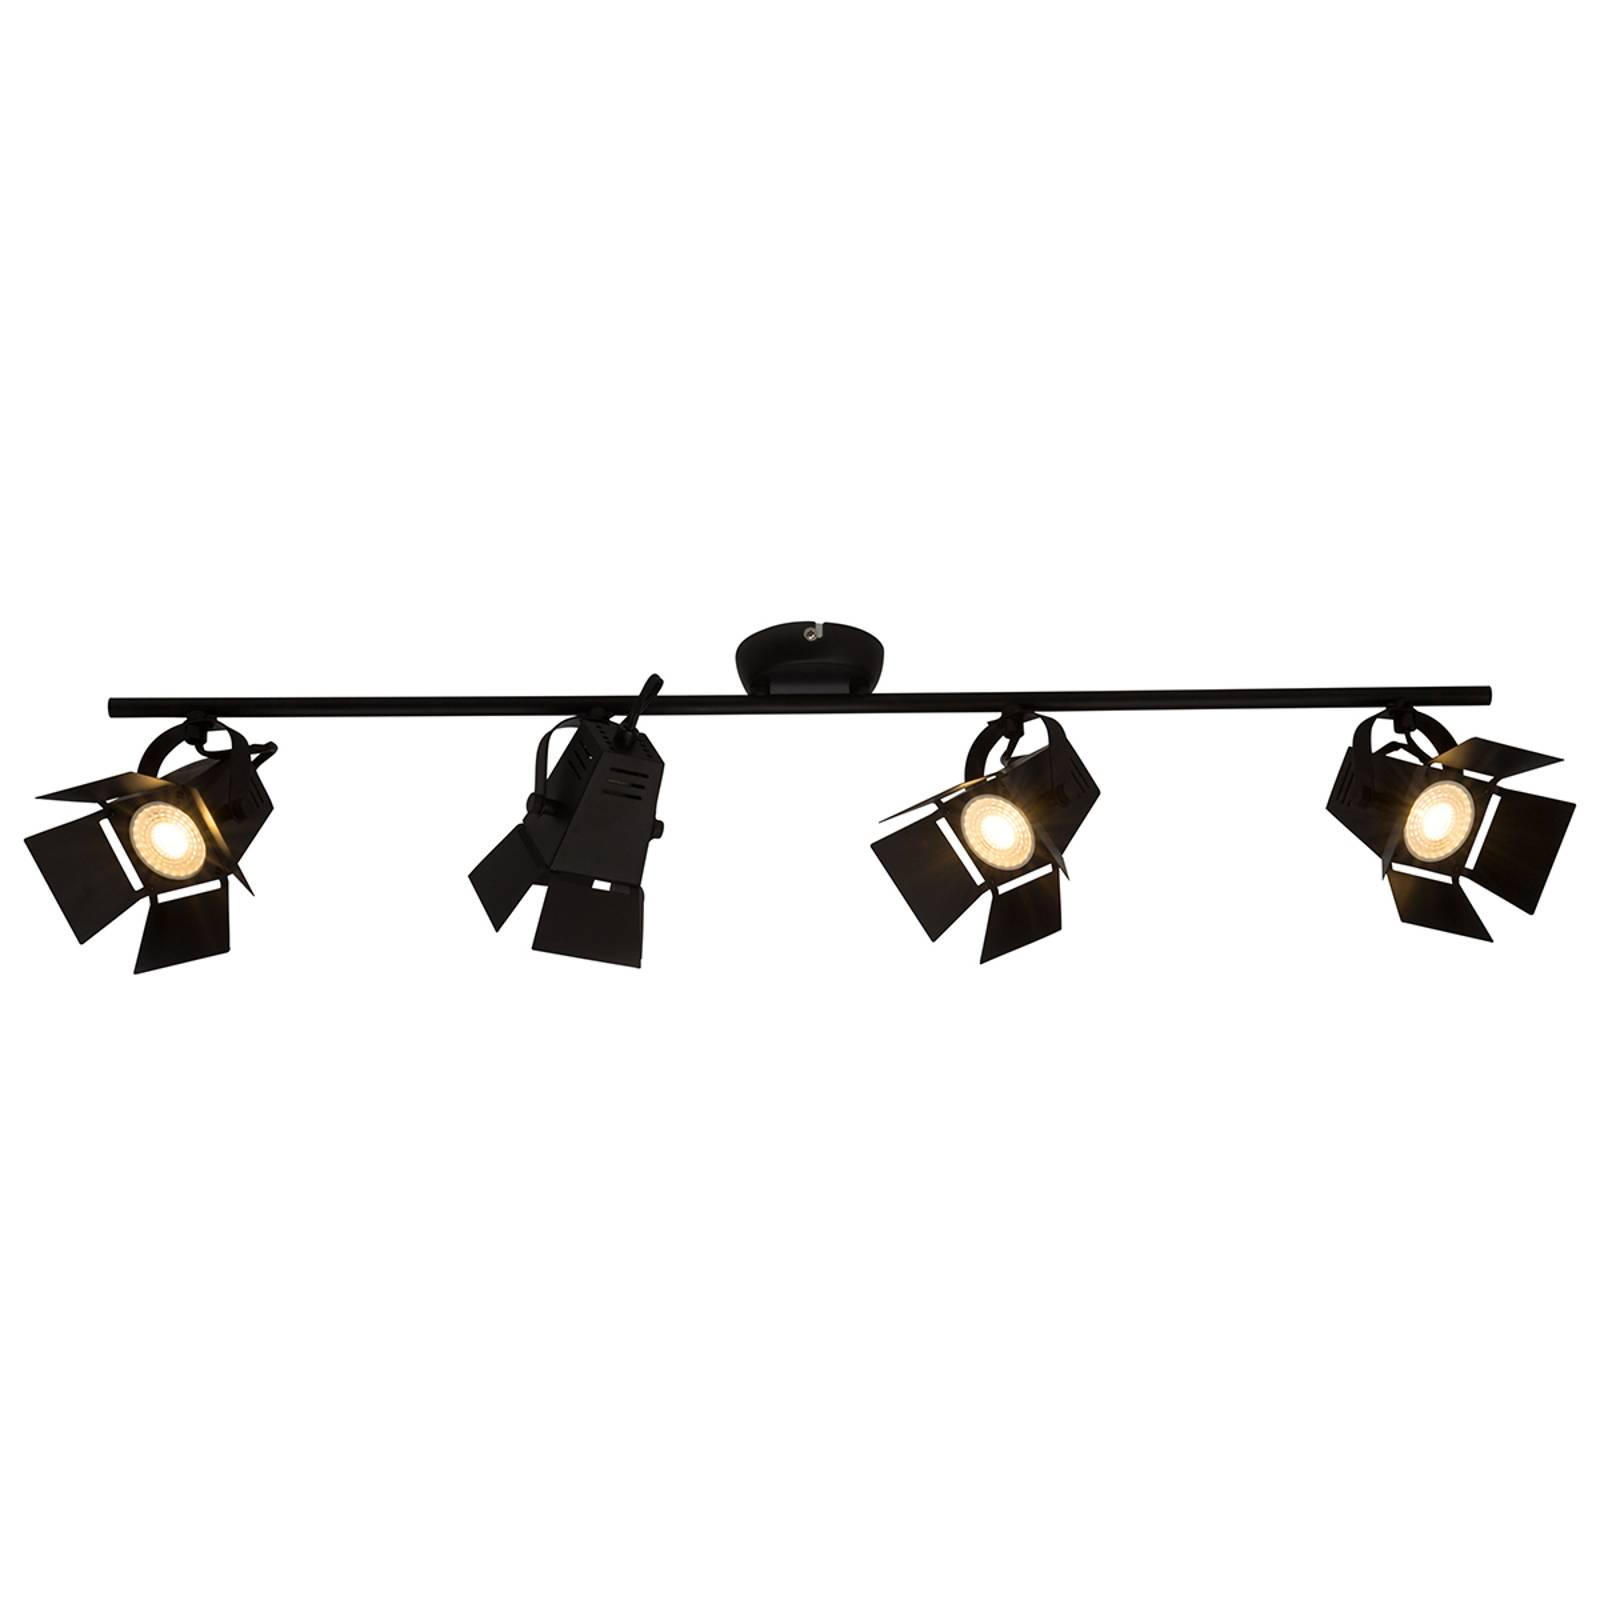 Movie - punktowa lampa sufitowa LED, czarna